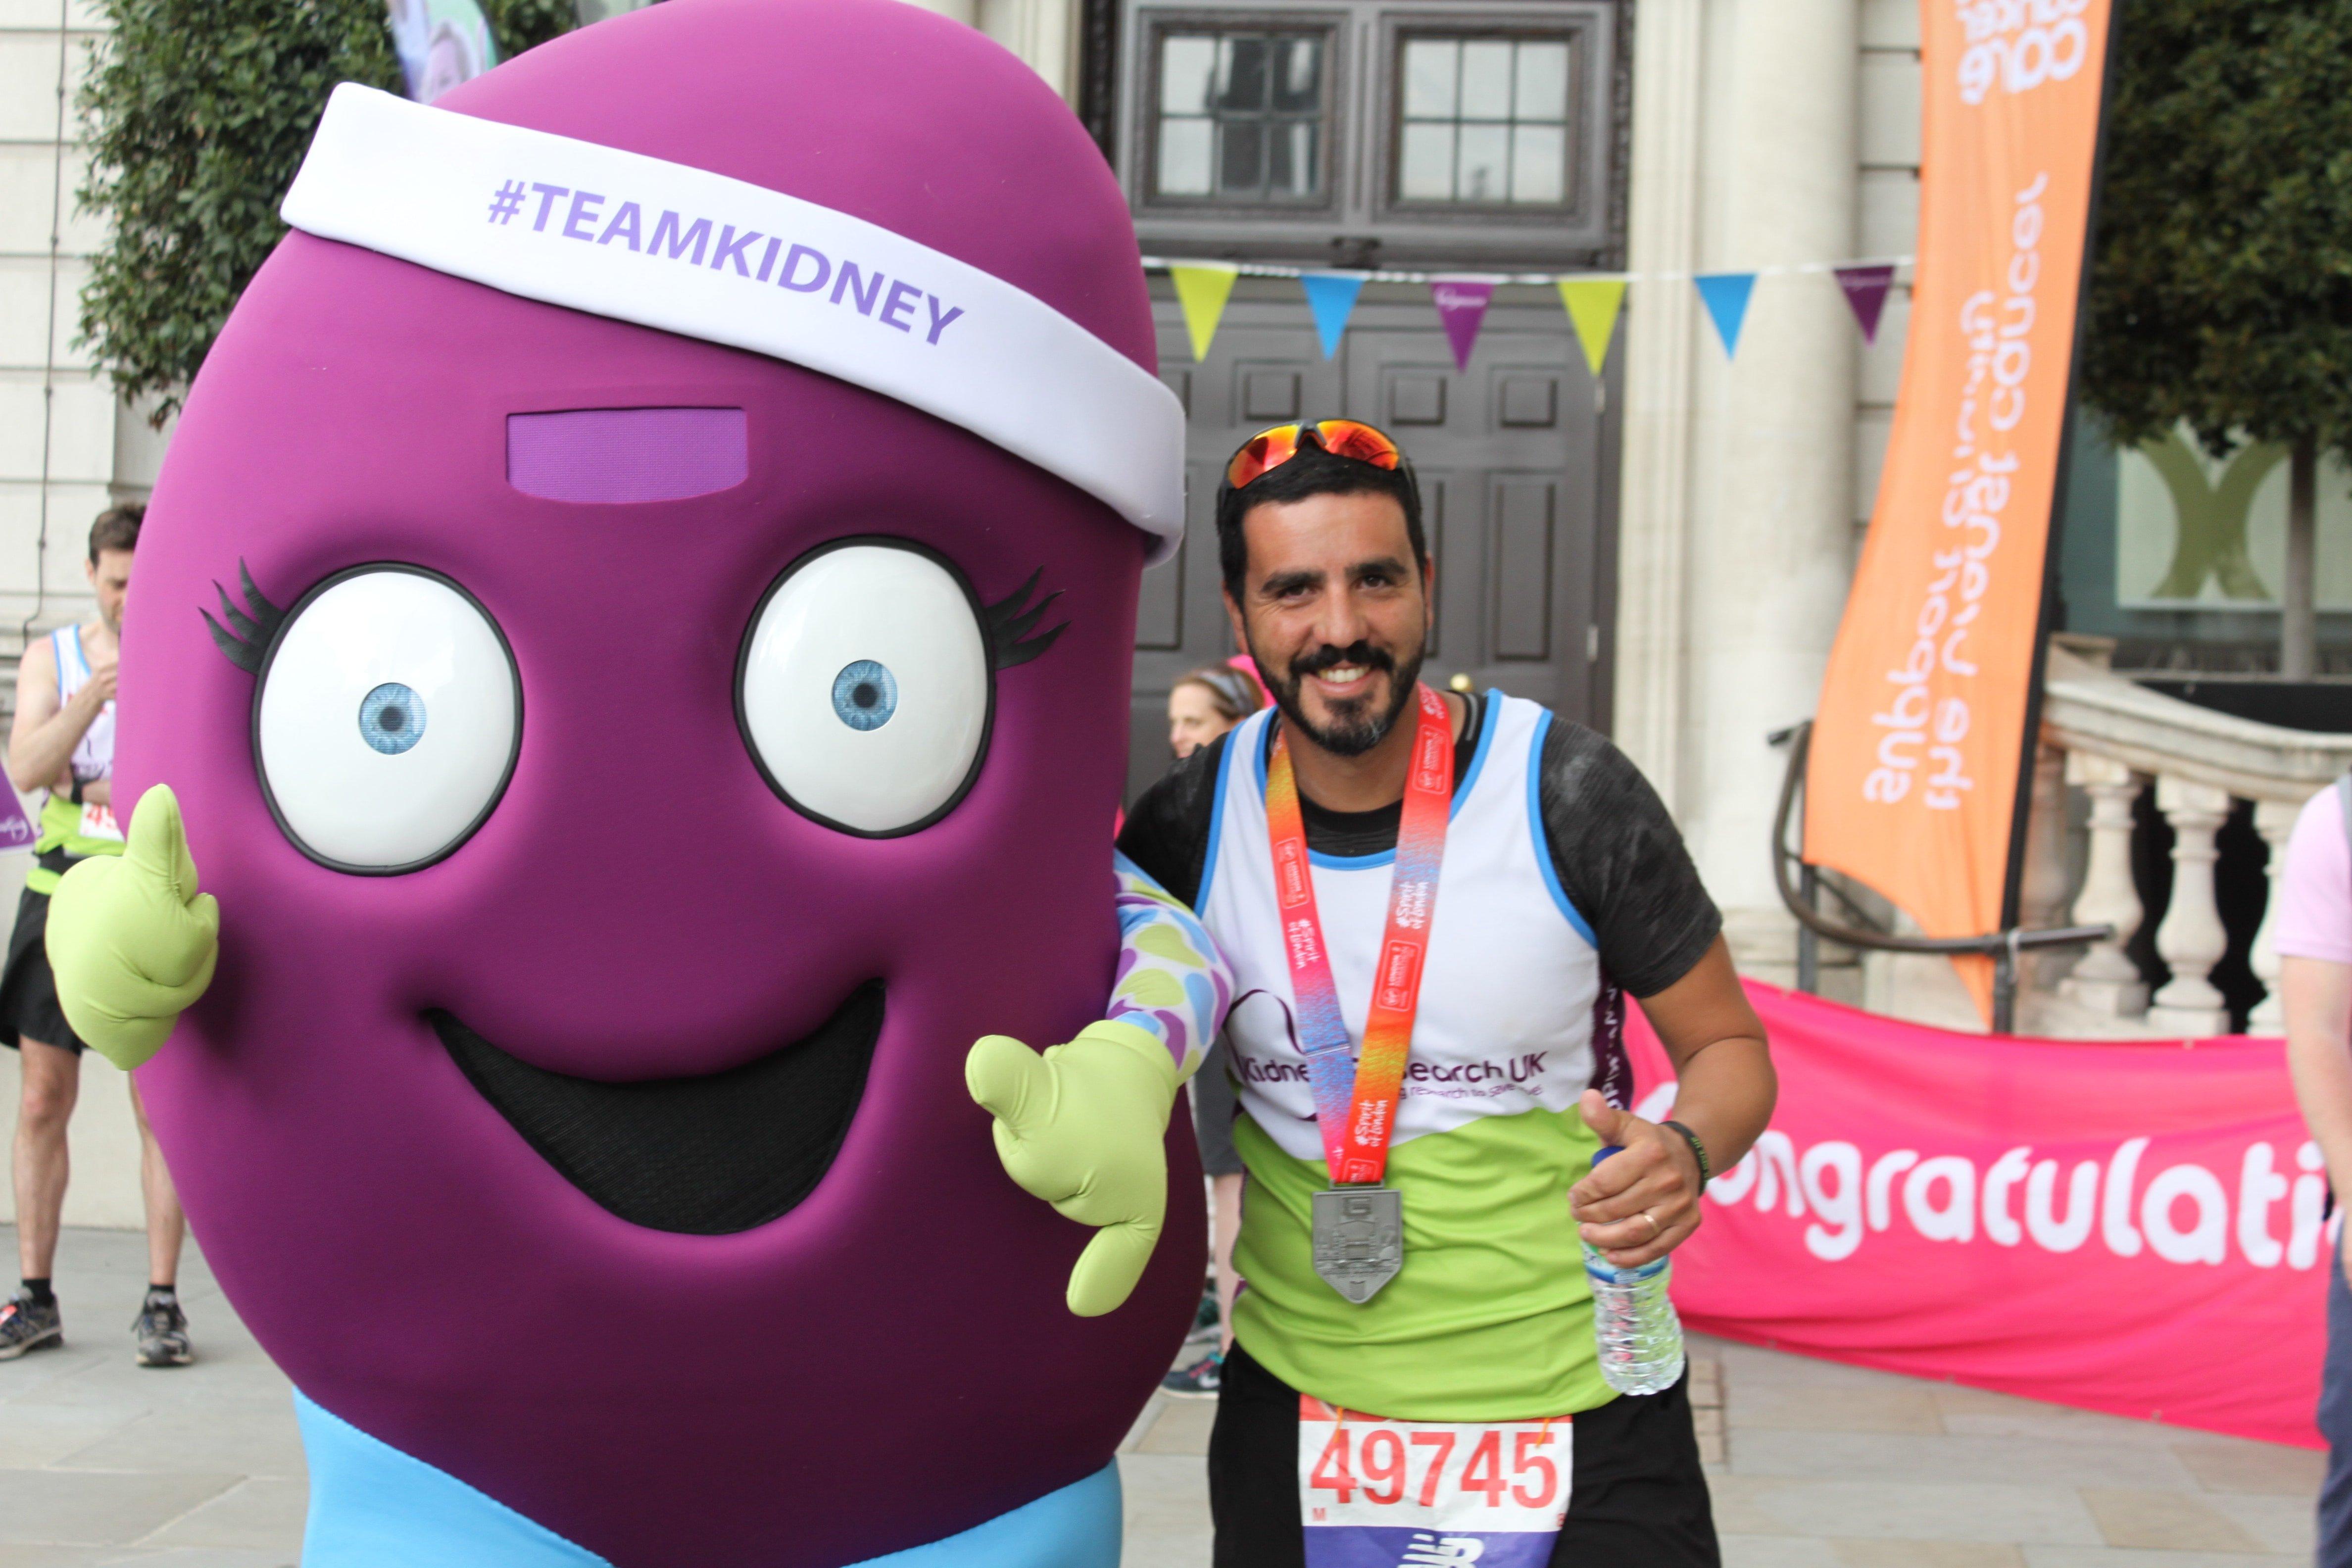 London Marathon Team Kidney